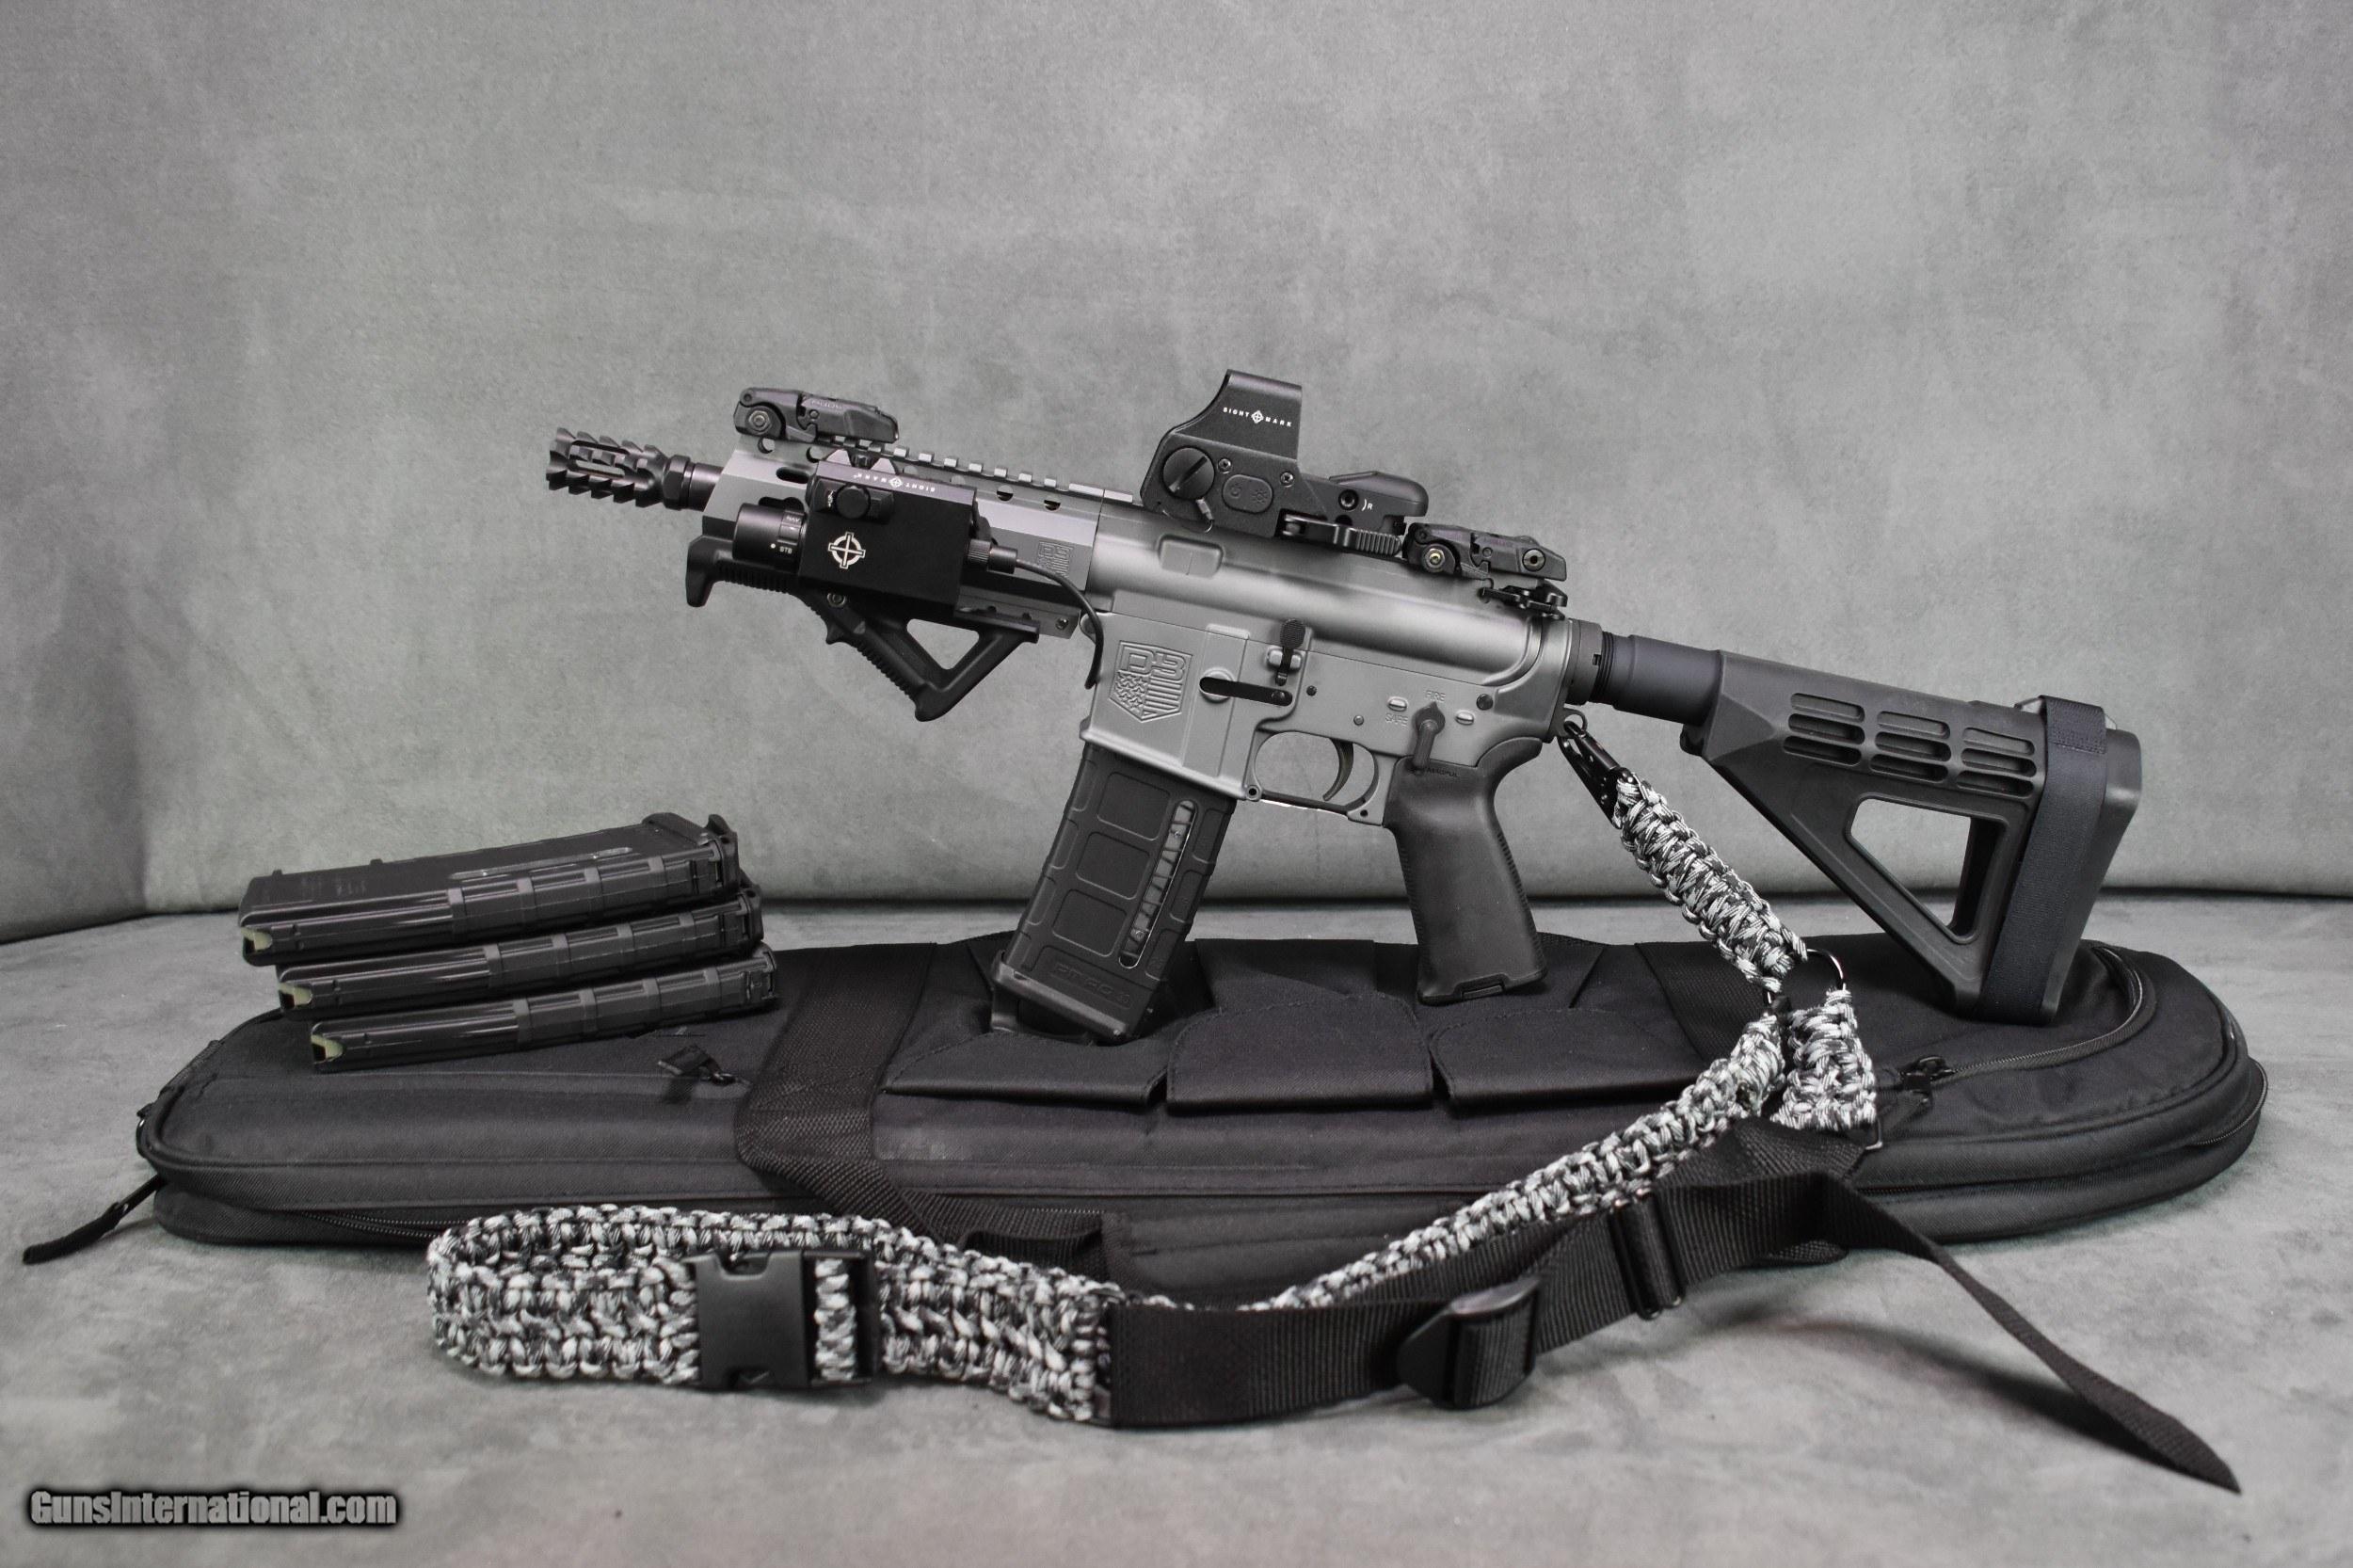 91eab51b1f4 DB15P AR-15 TACTICAL PISTOL IN GRAY - 1 of 11 ...